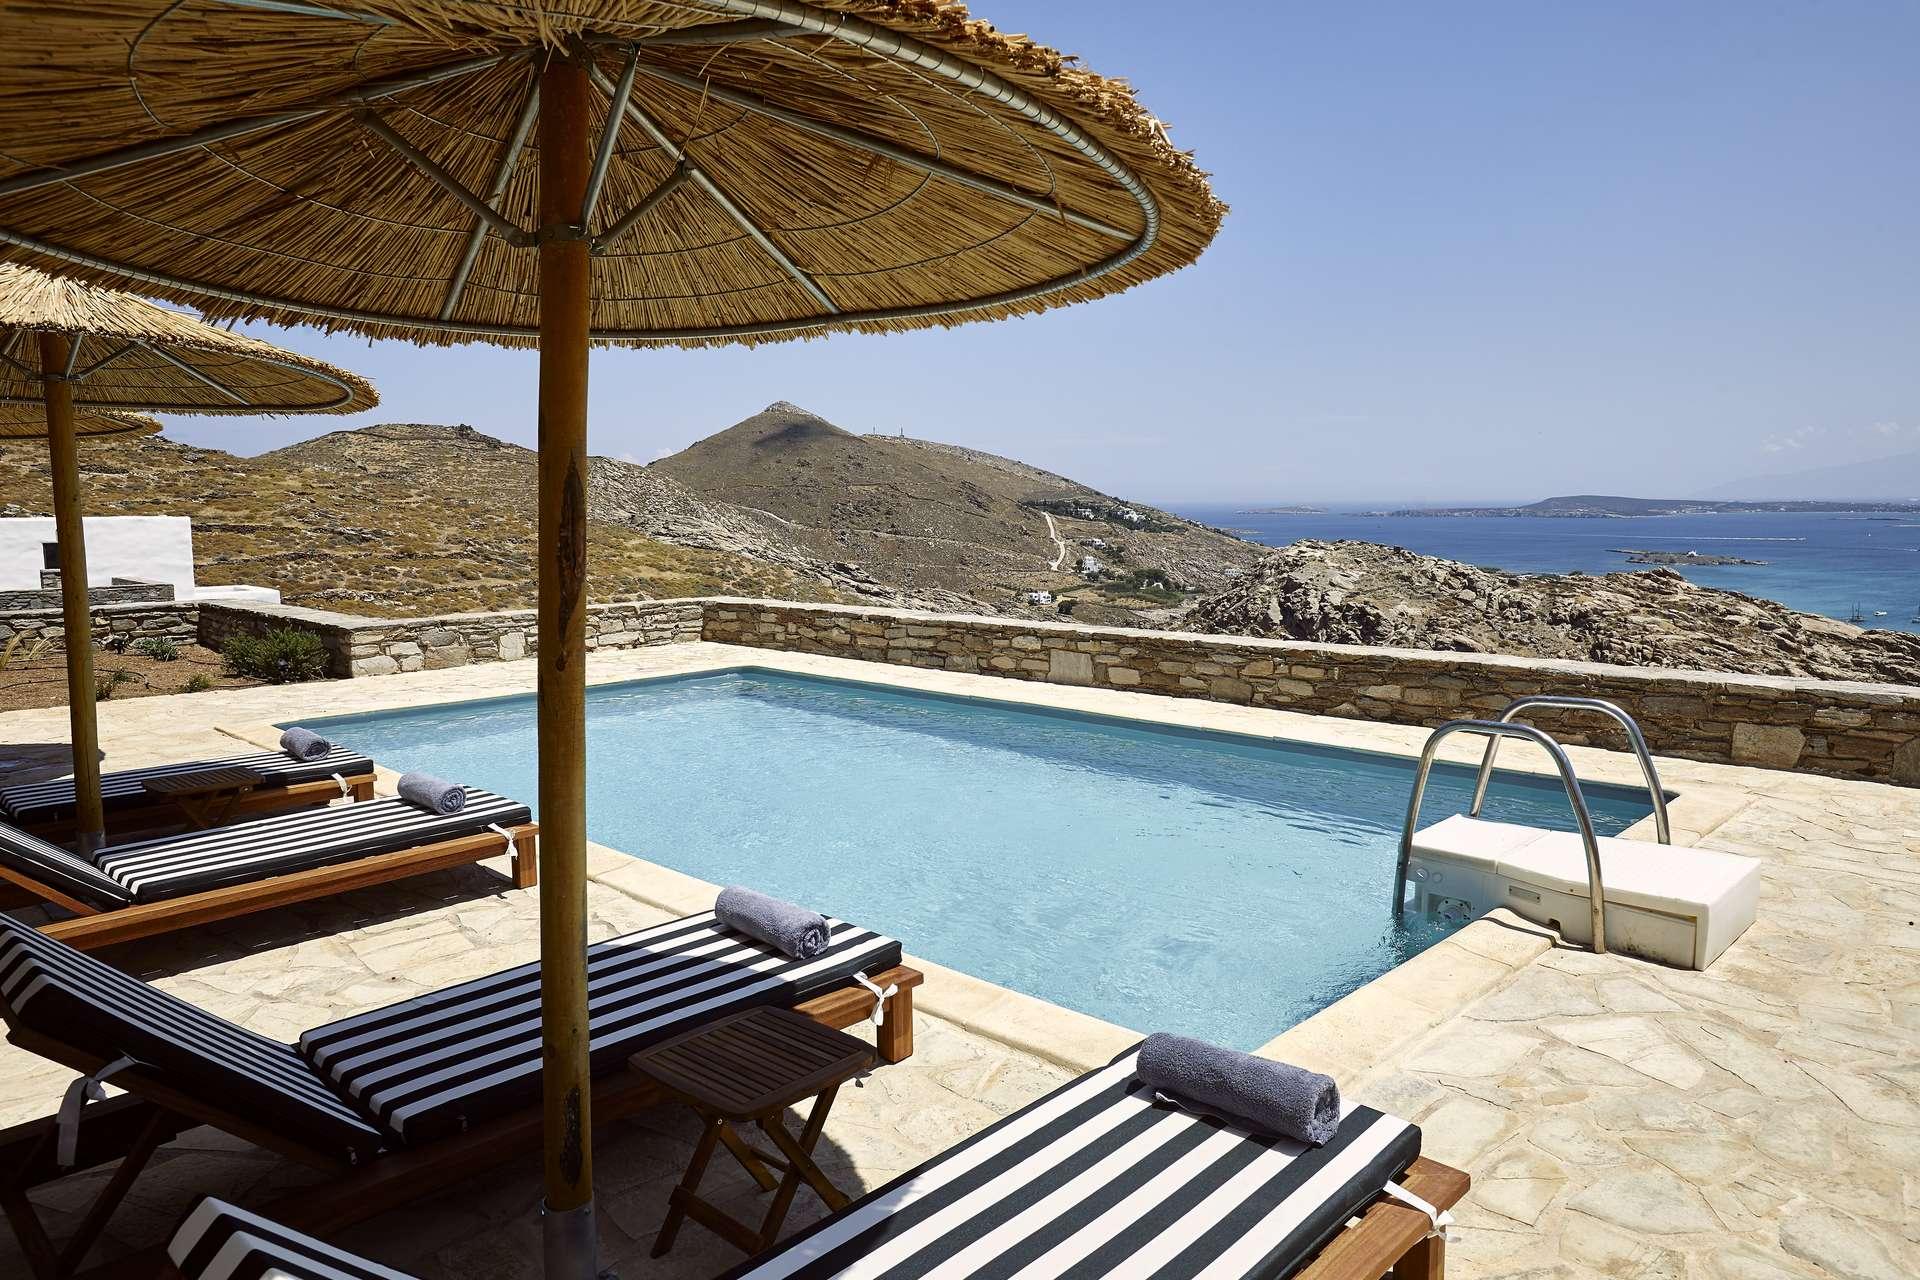 Luxury vacation rentals europe - Greece - Par os - Kolympithres - Navy - Image 1/8